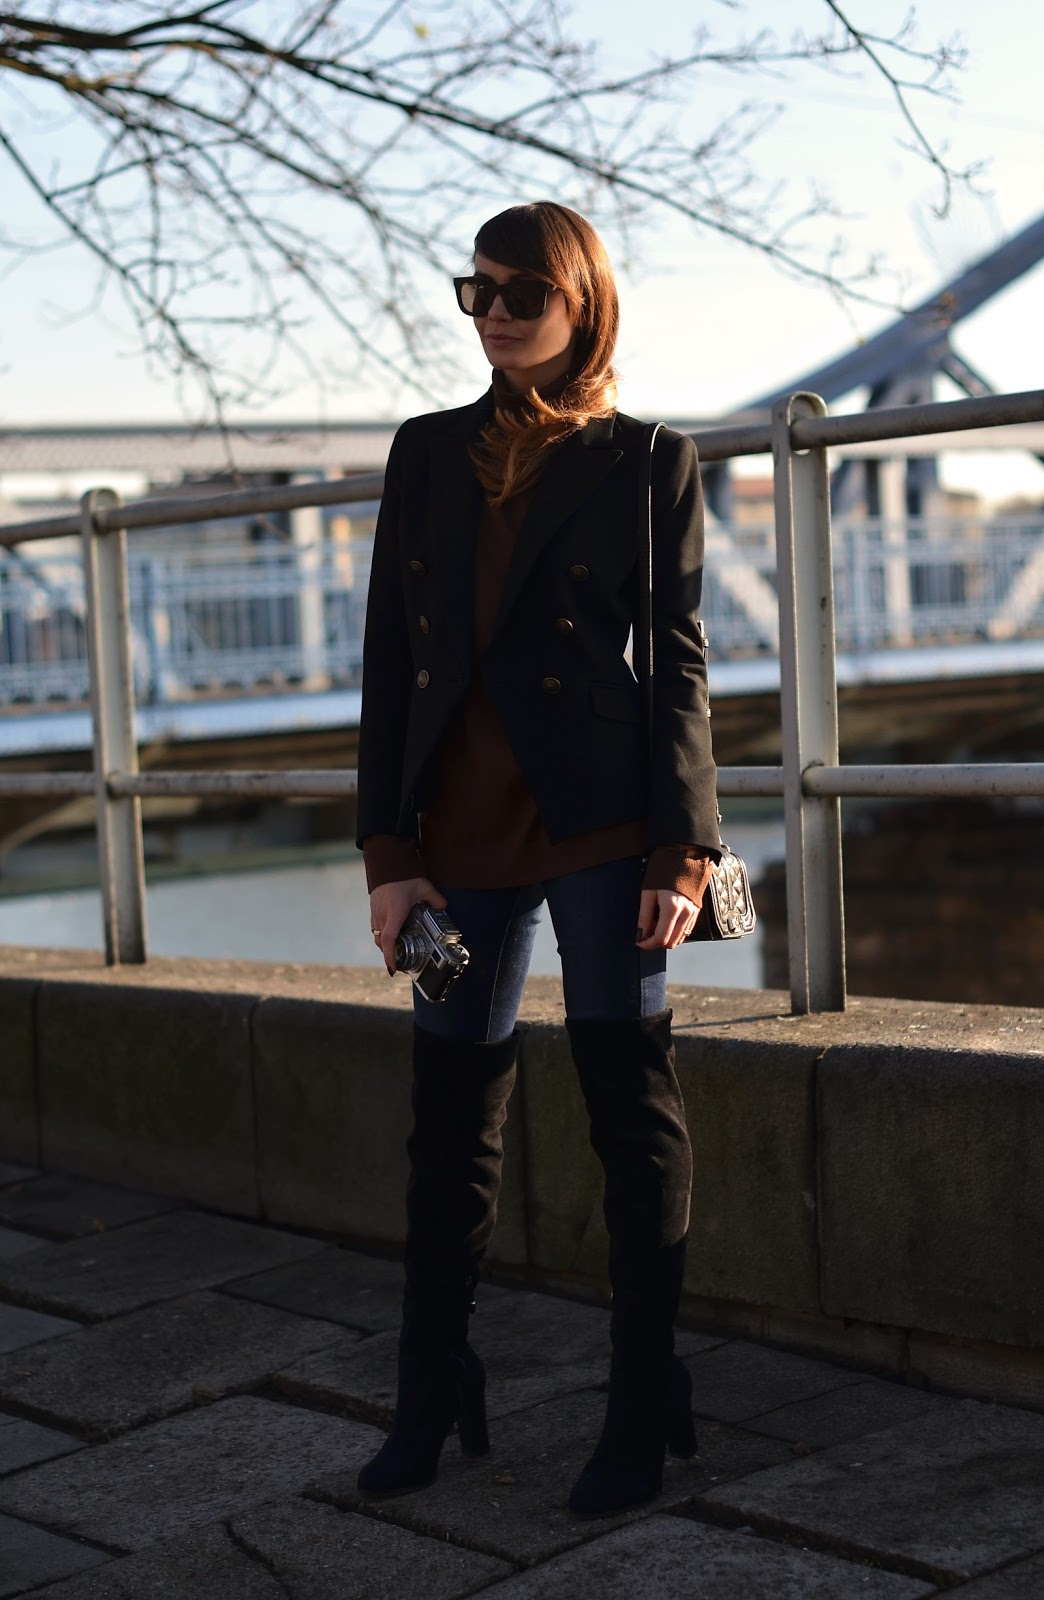 buty za kolano | blogerka modowa